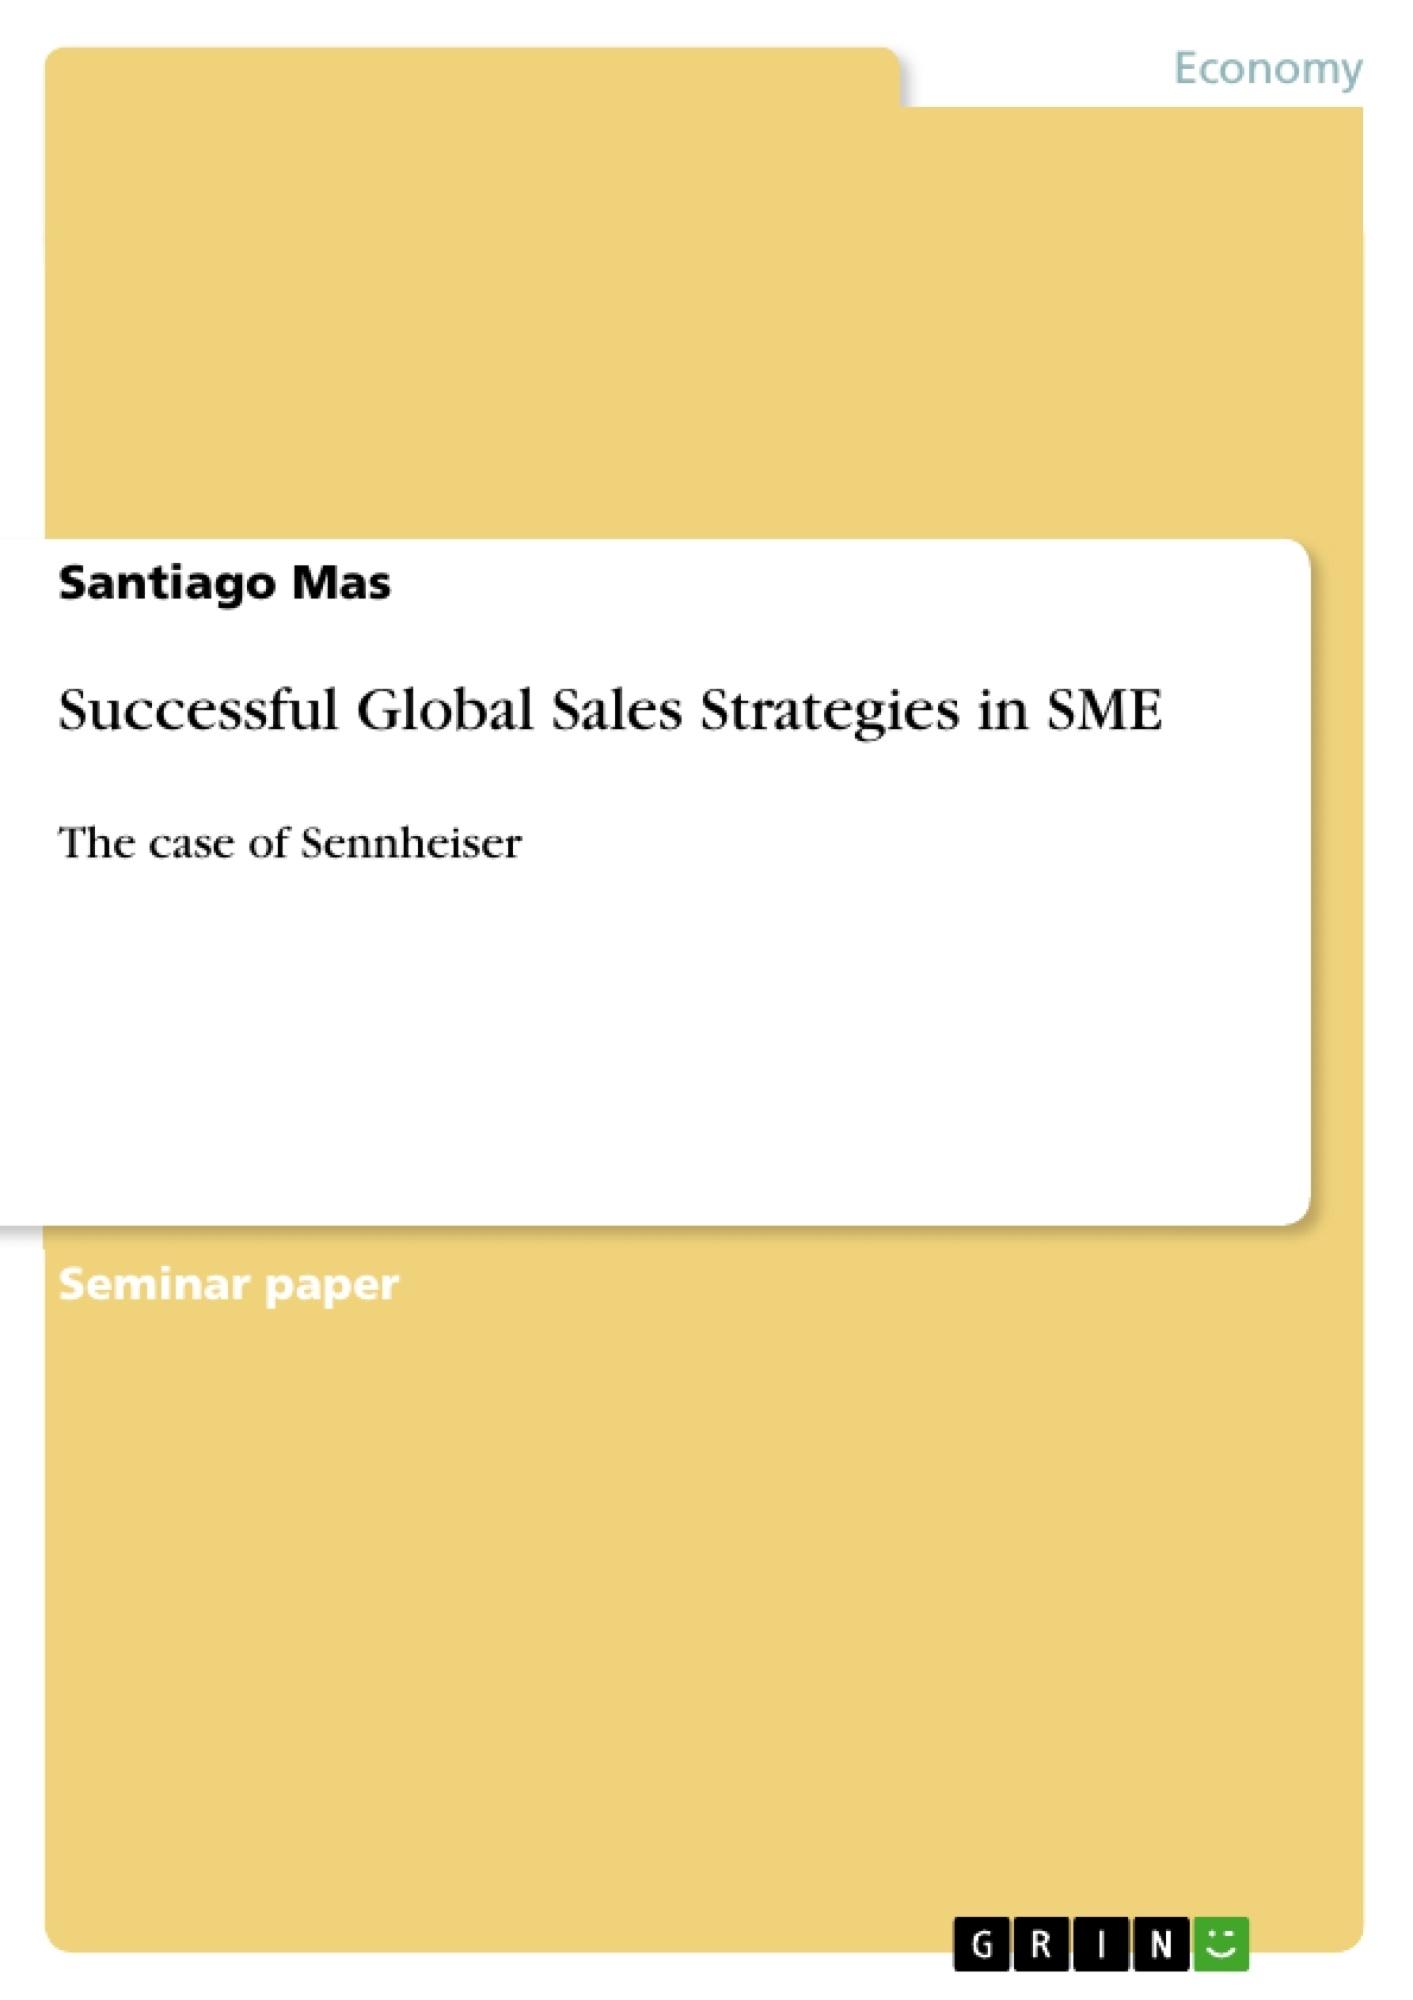 Title: Successful Global Sales Strategies in SME